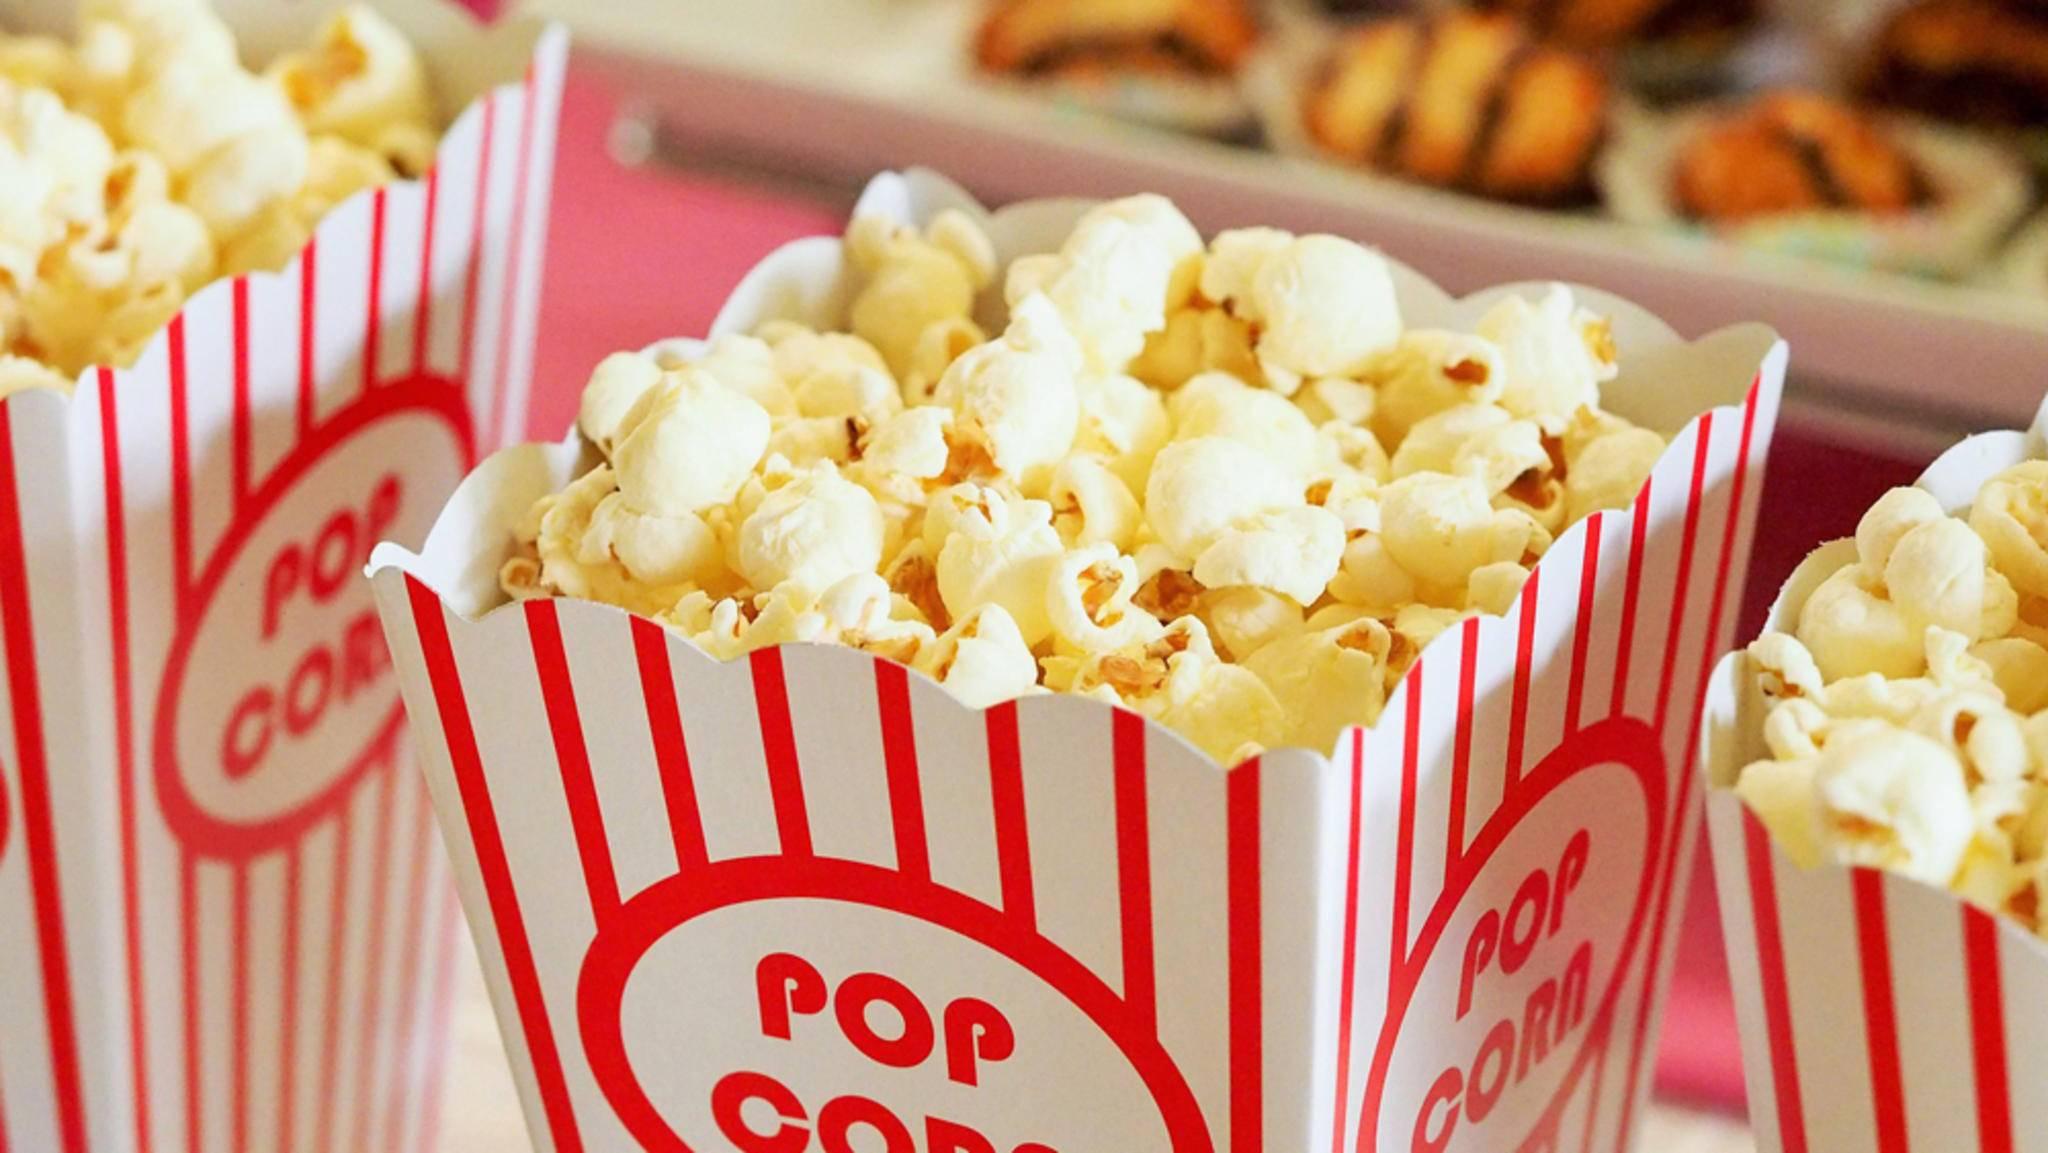 Snack-Klassiker: Popcorn kannst Du in vielen verschiedenen Varianten genießen.